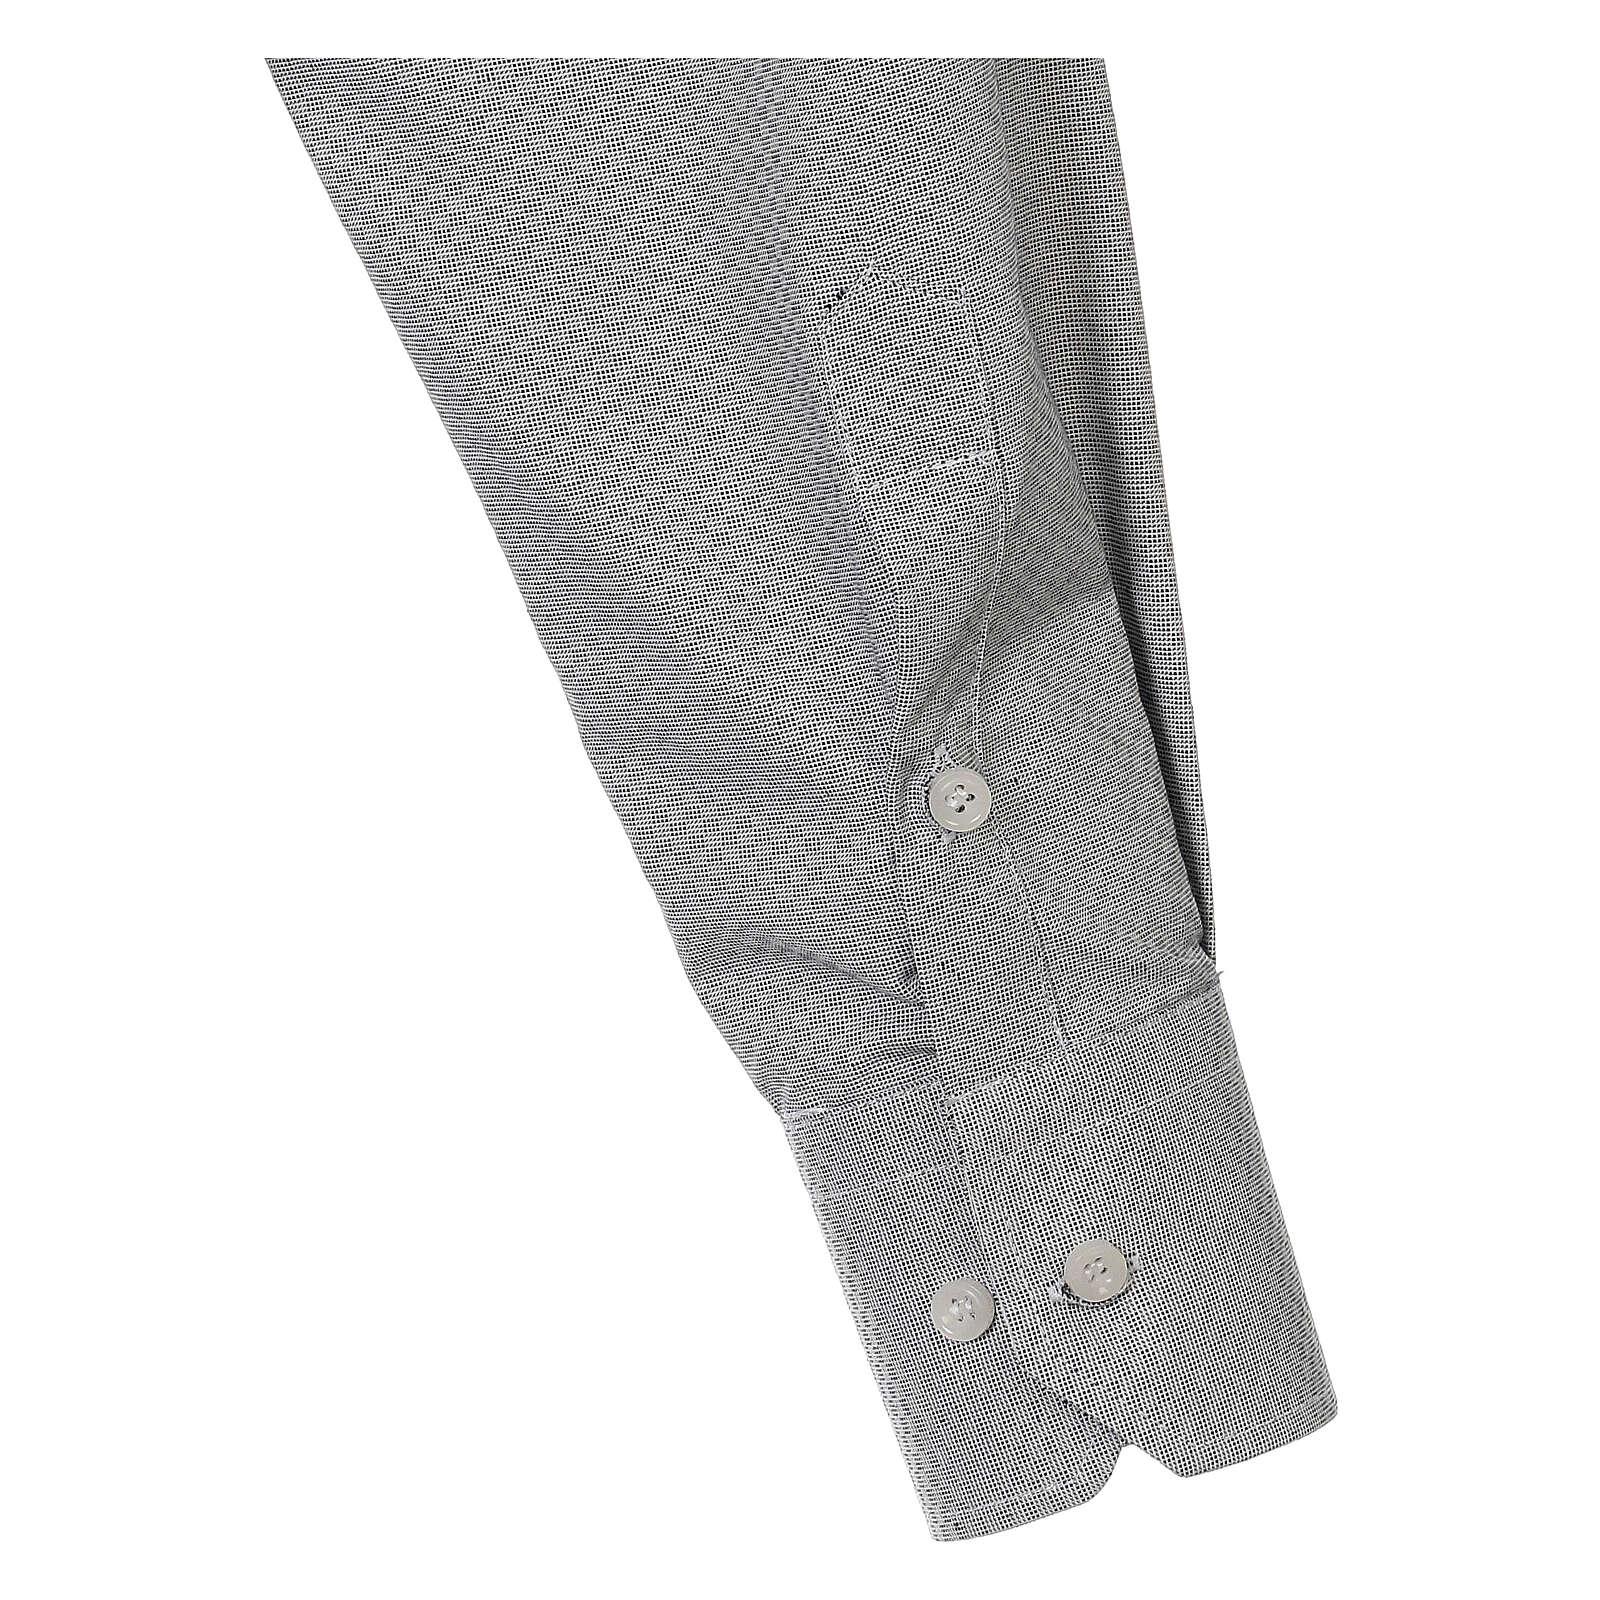 Camisa clergy algodón Marangel gris M. Larga 4